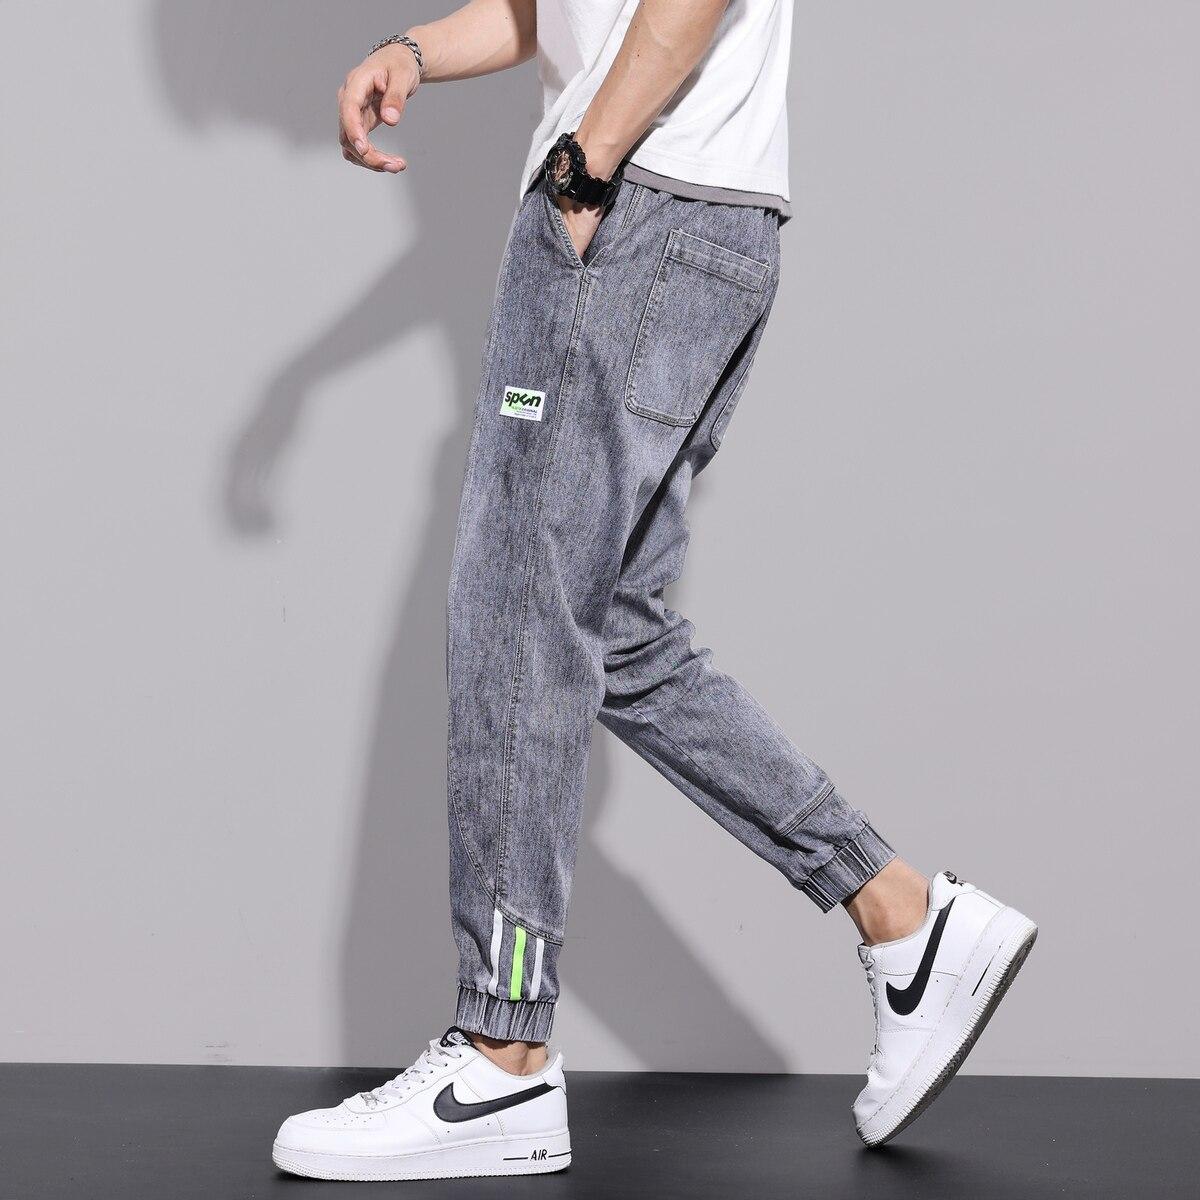 Trendy Brand Autumn New Jeans Men's Trendy Loose Large Size Ankle-Length Men's Pants Overalls Harem Trousers jeans